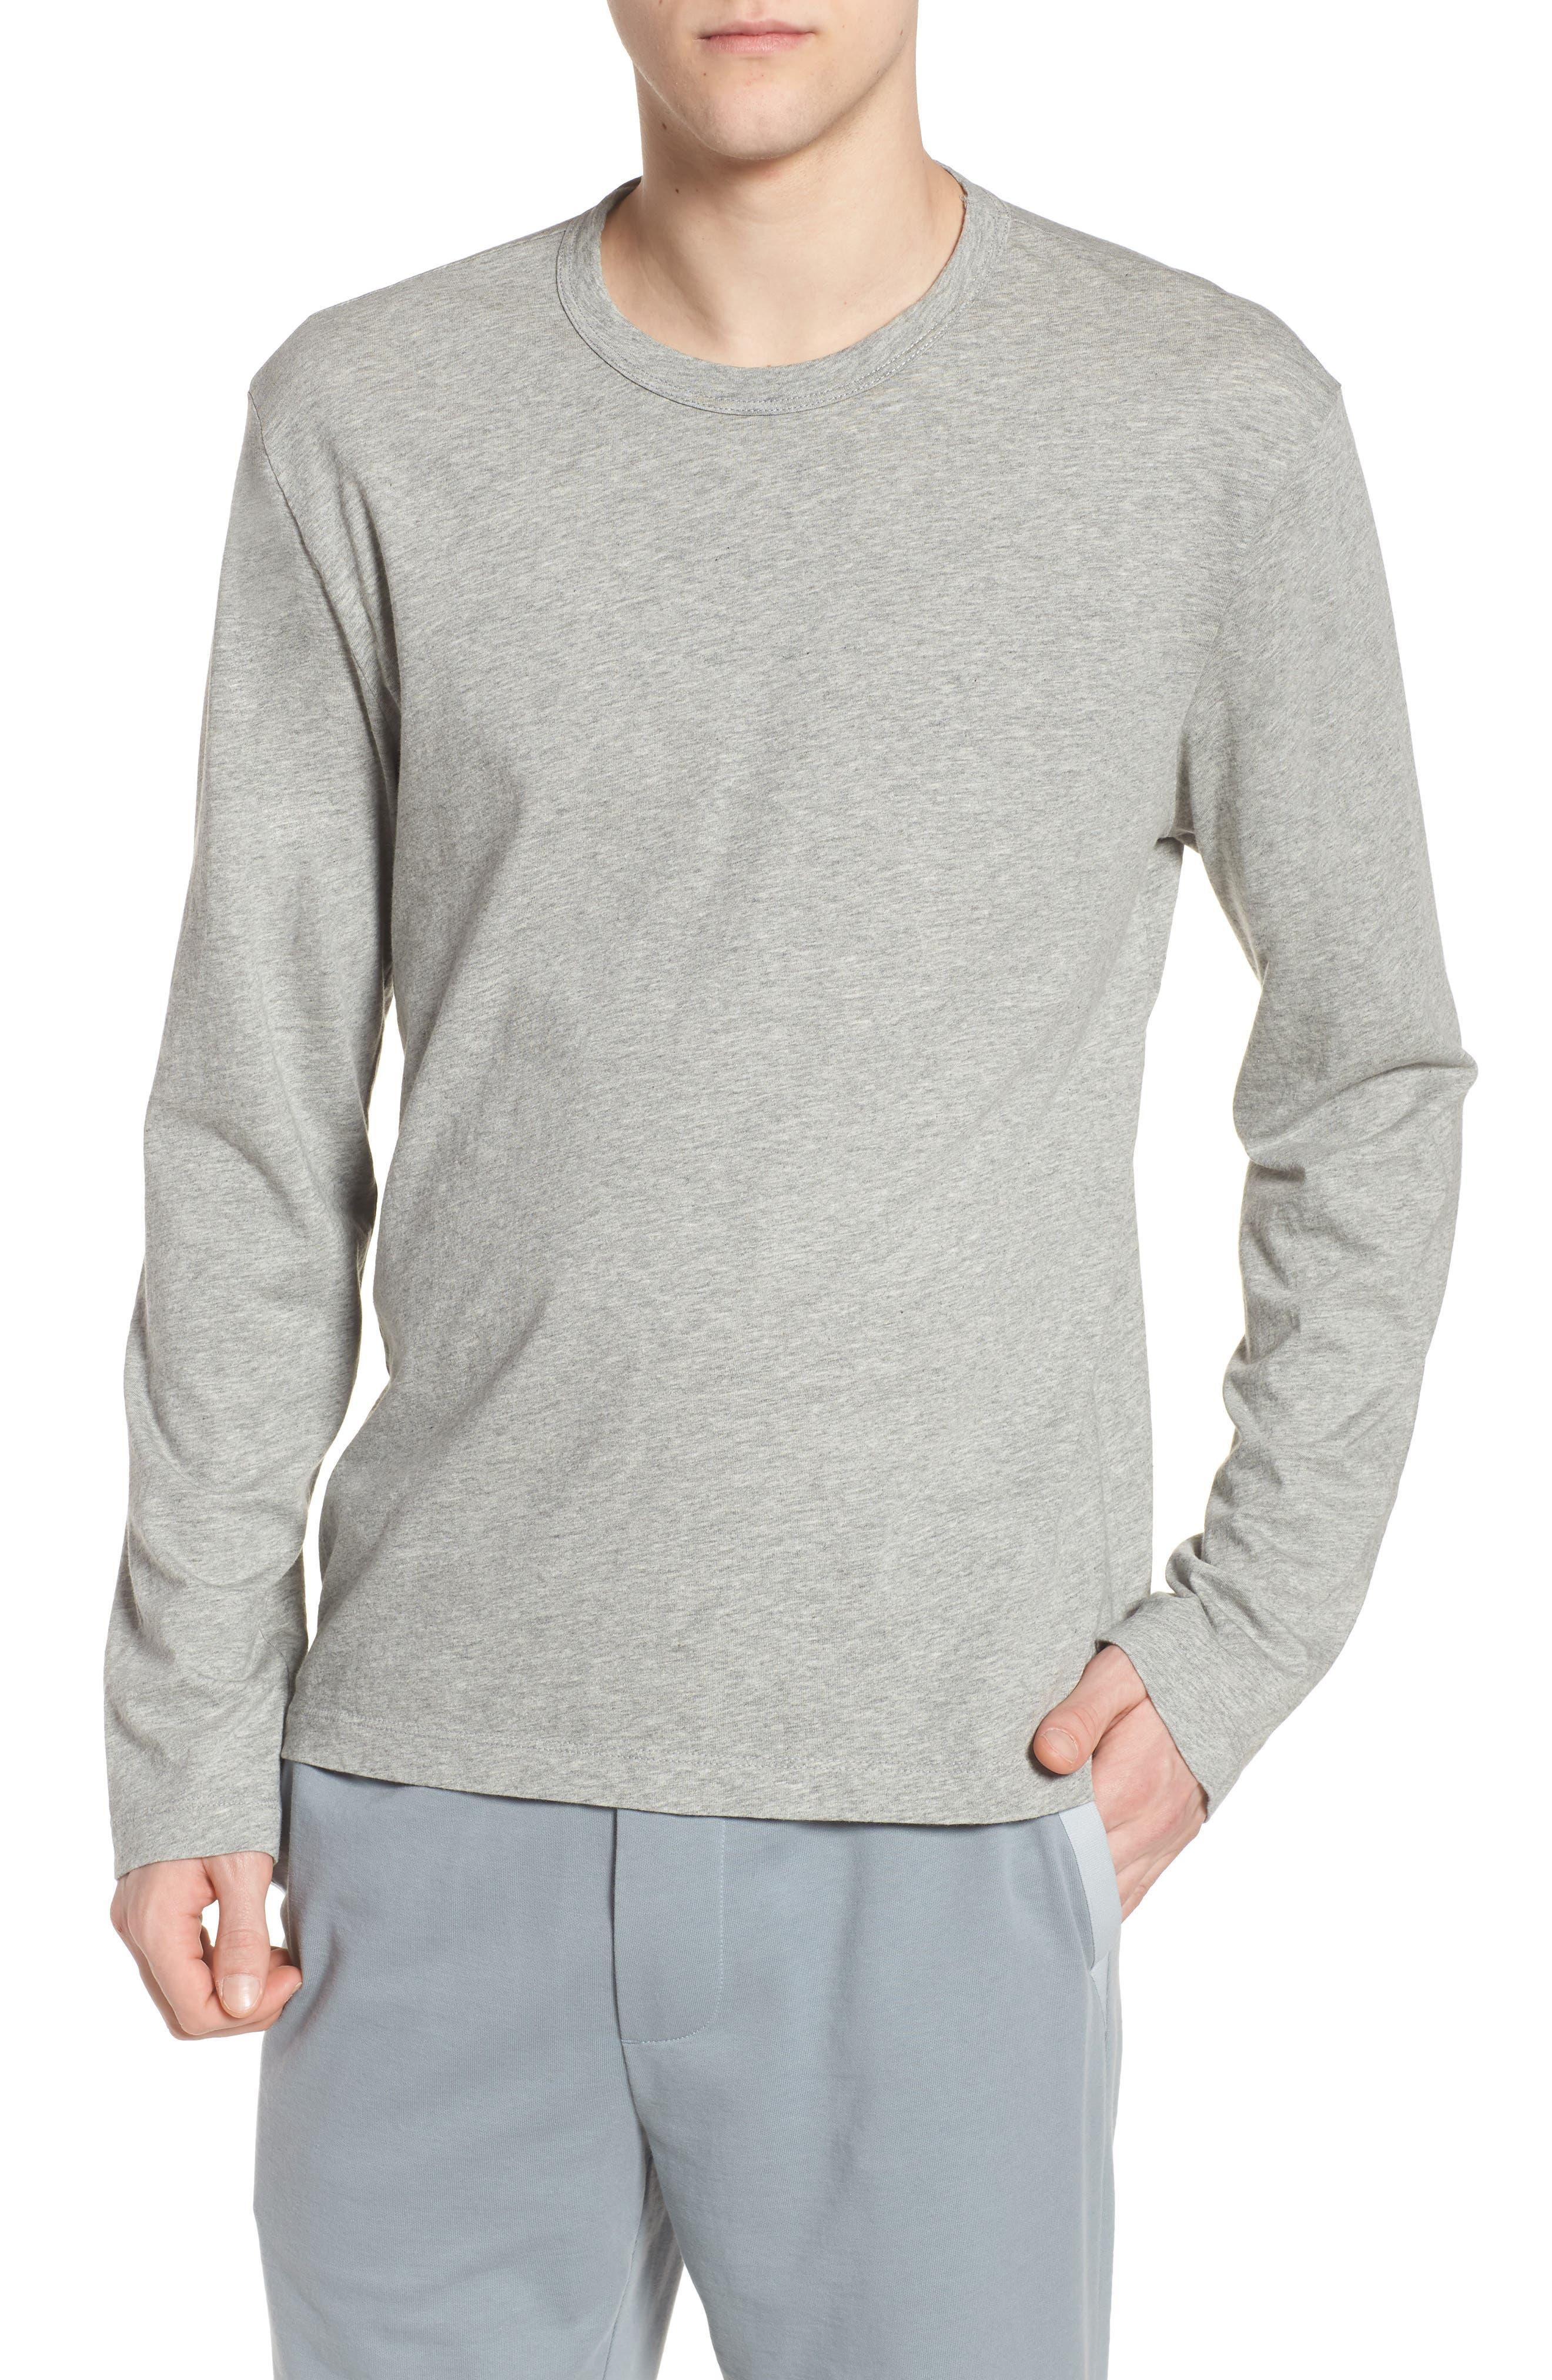 Alternate Image 1 Selected - James Perse Crewneck Cotton Sweatshirt